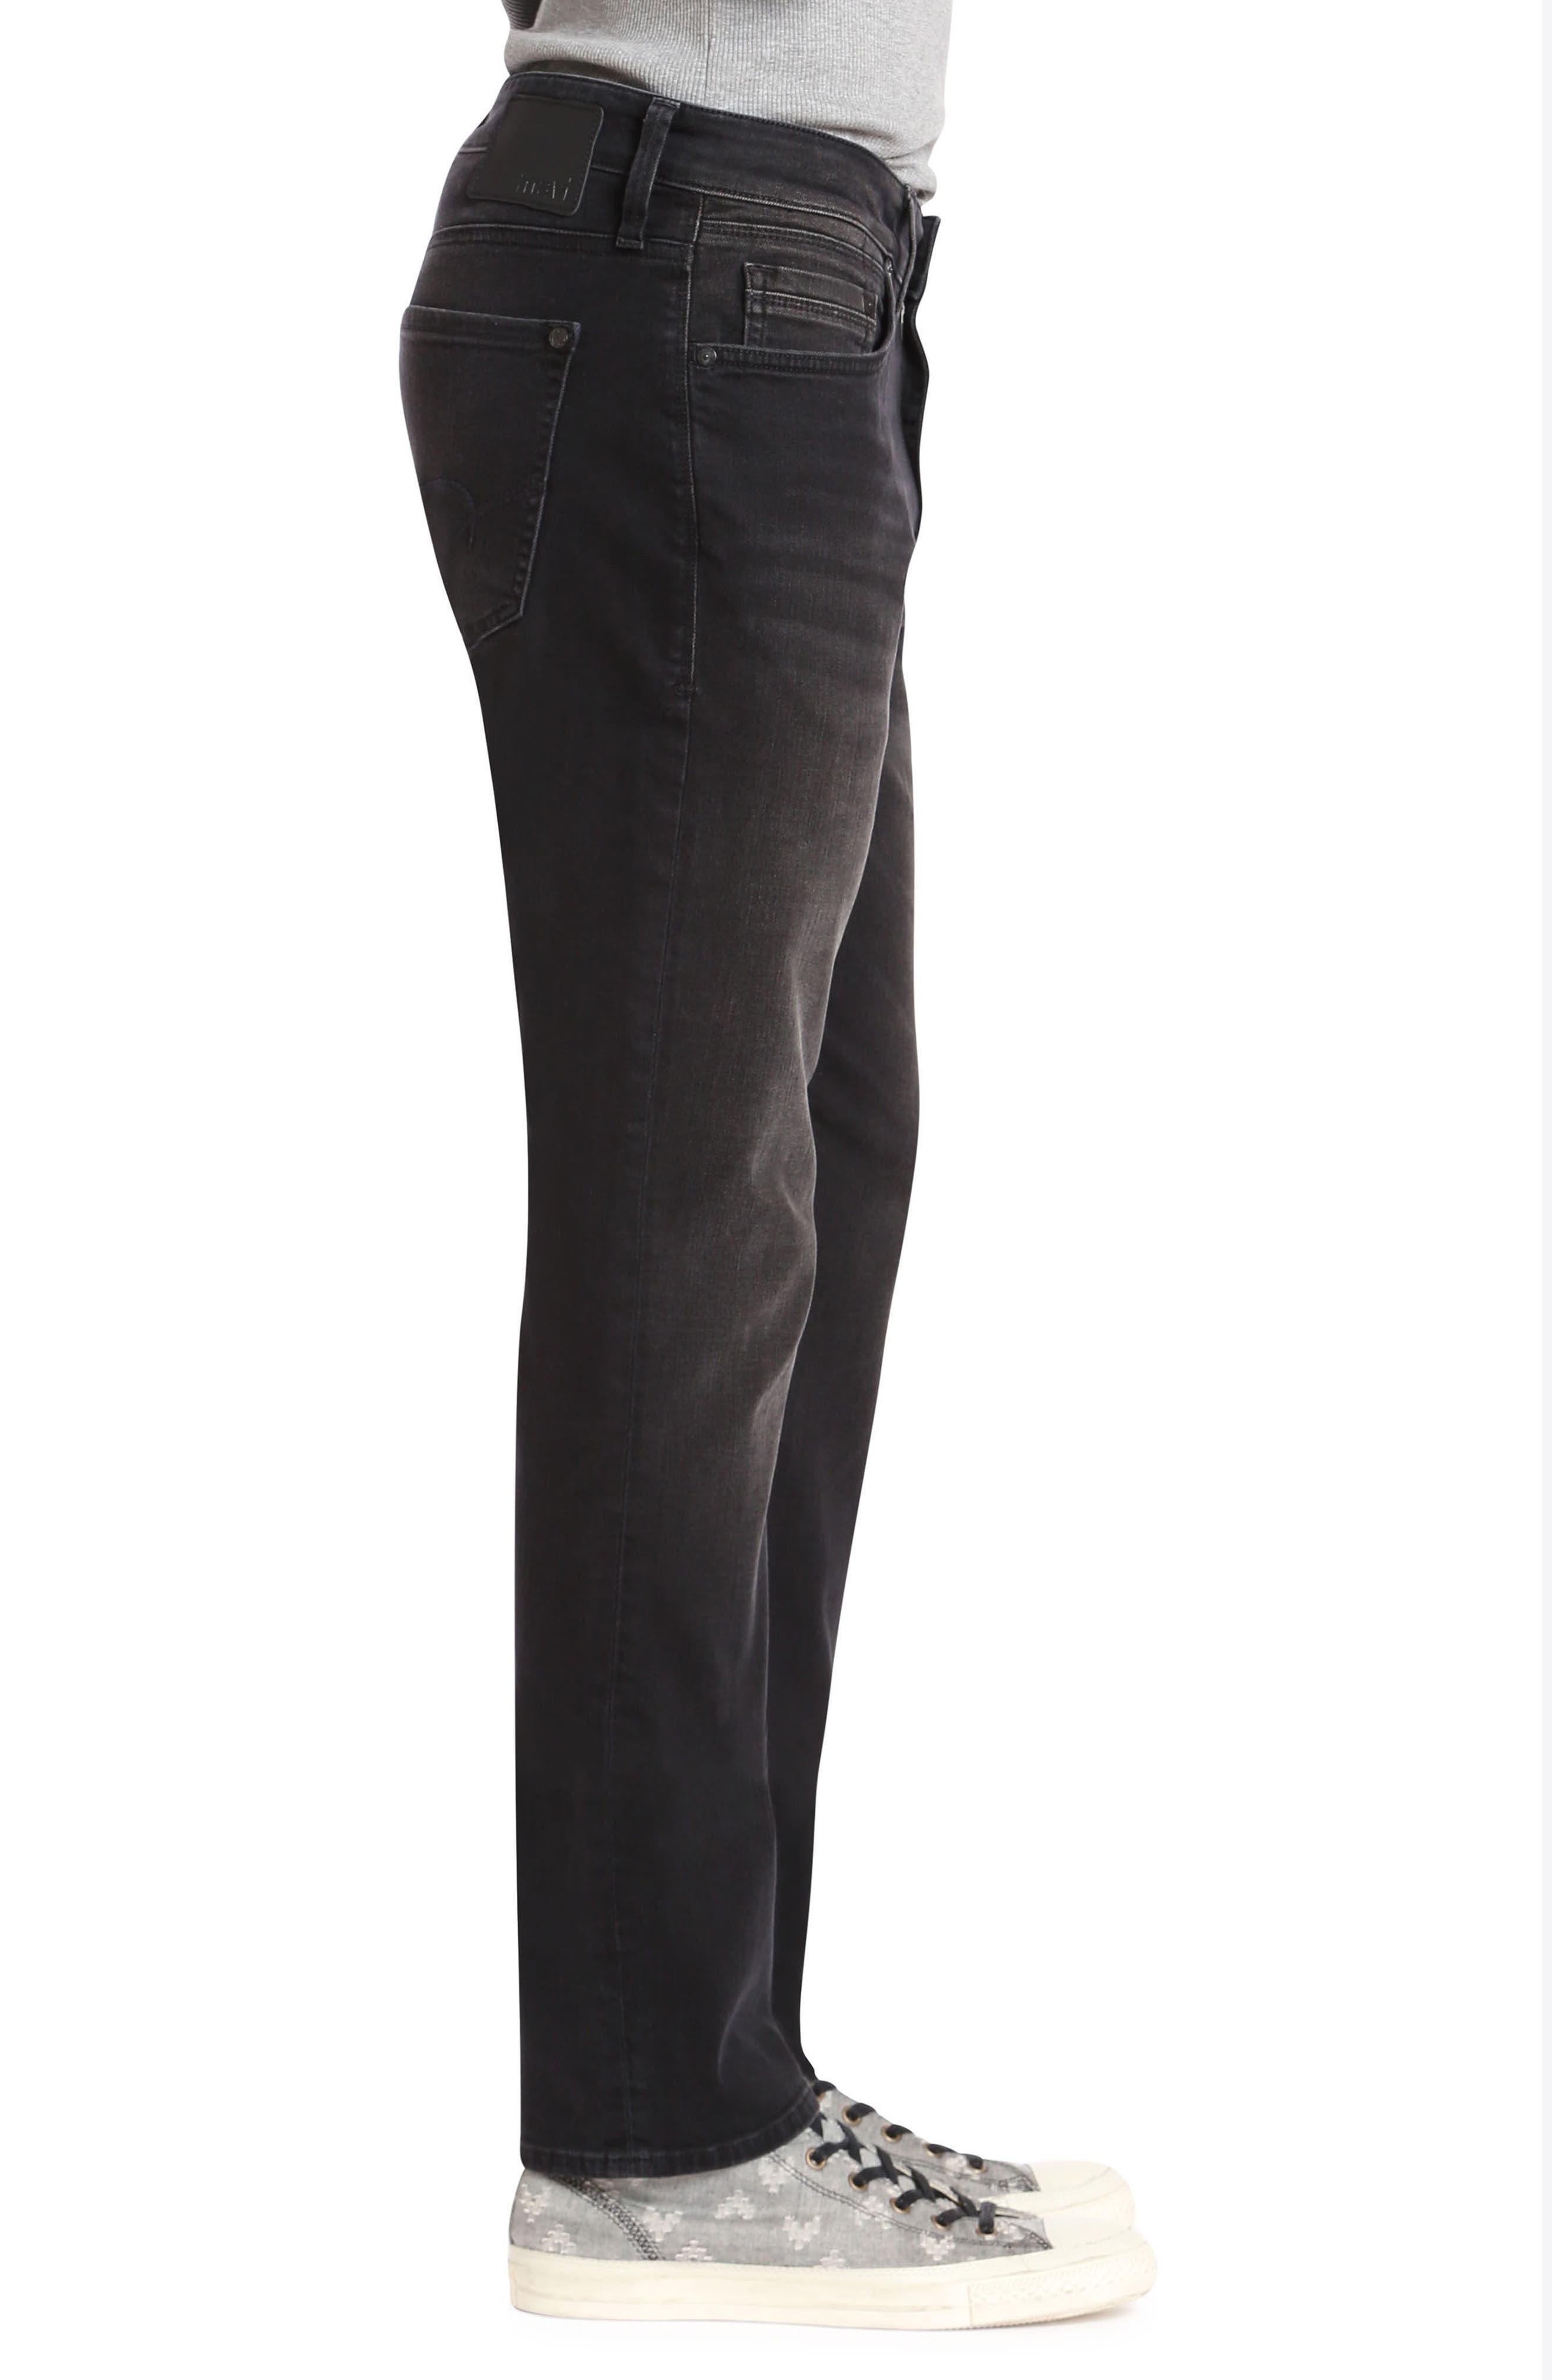 Marcus Slim Straight Leg Jeans,                             Alternate thumbnail 3, color,                             Dark Smoke Williamsburg